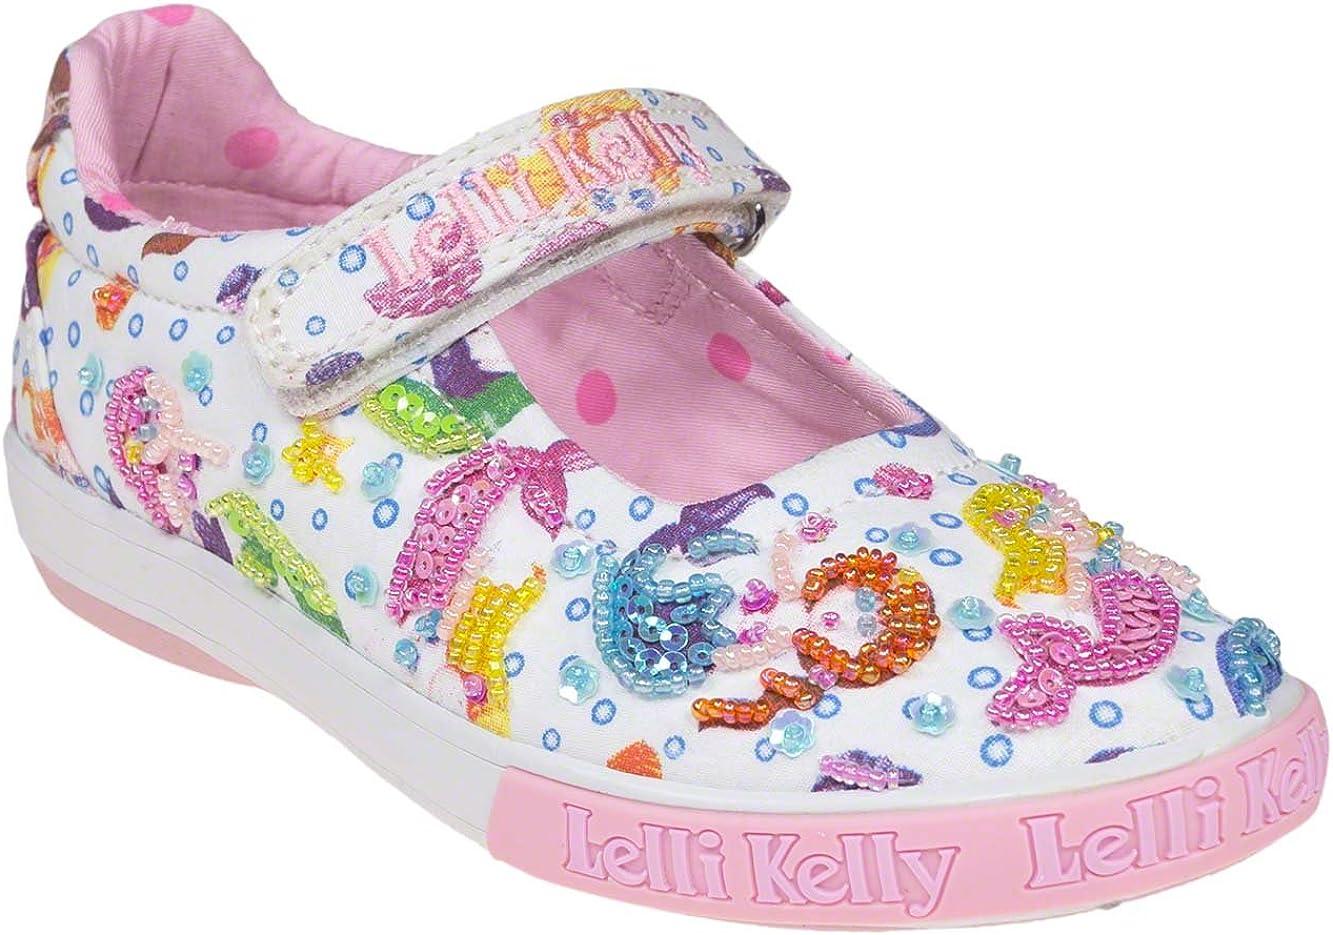 Lelli Kelly Mermaid Dolly Girls Canvas Shoes